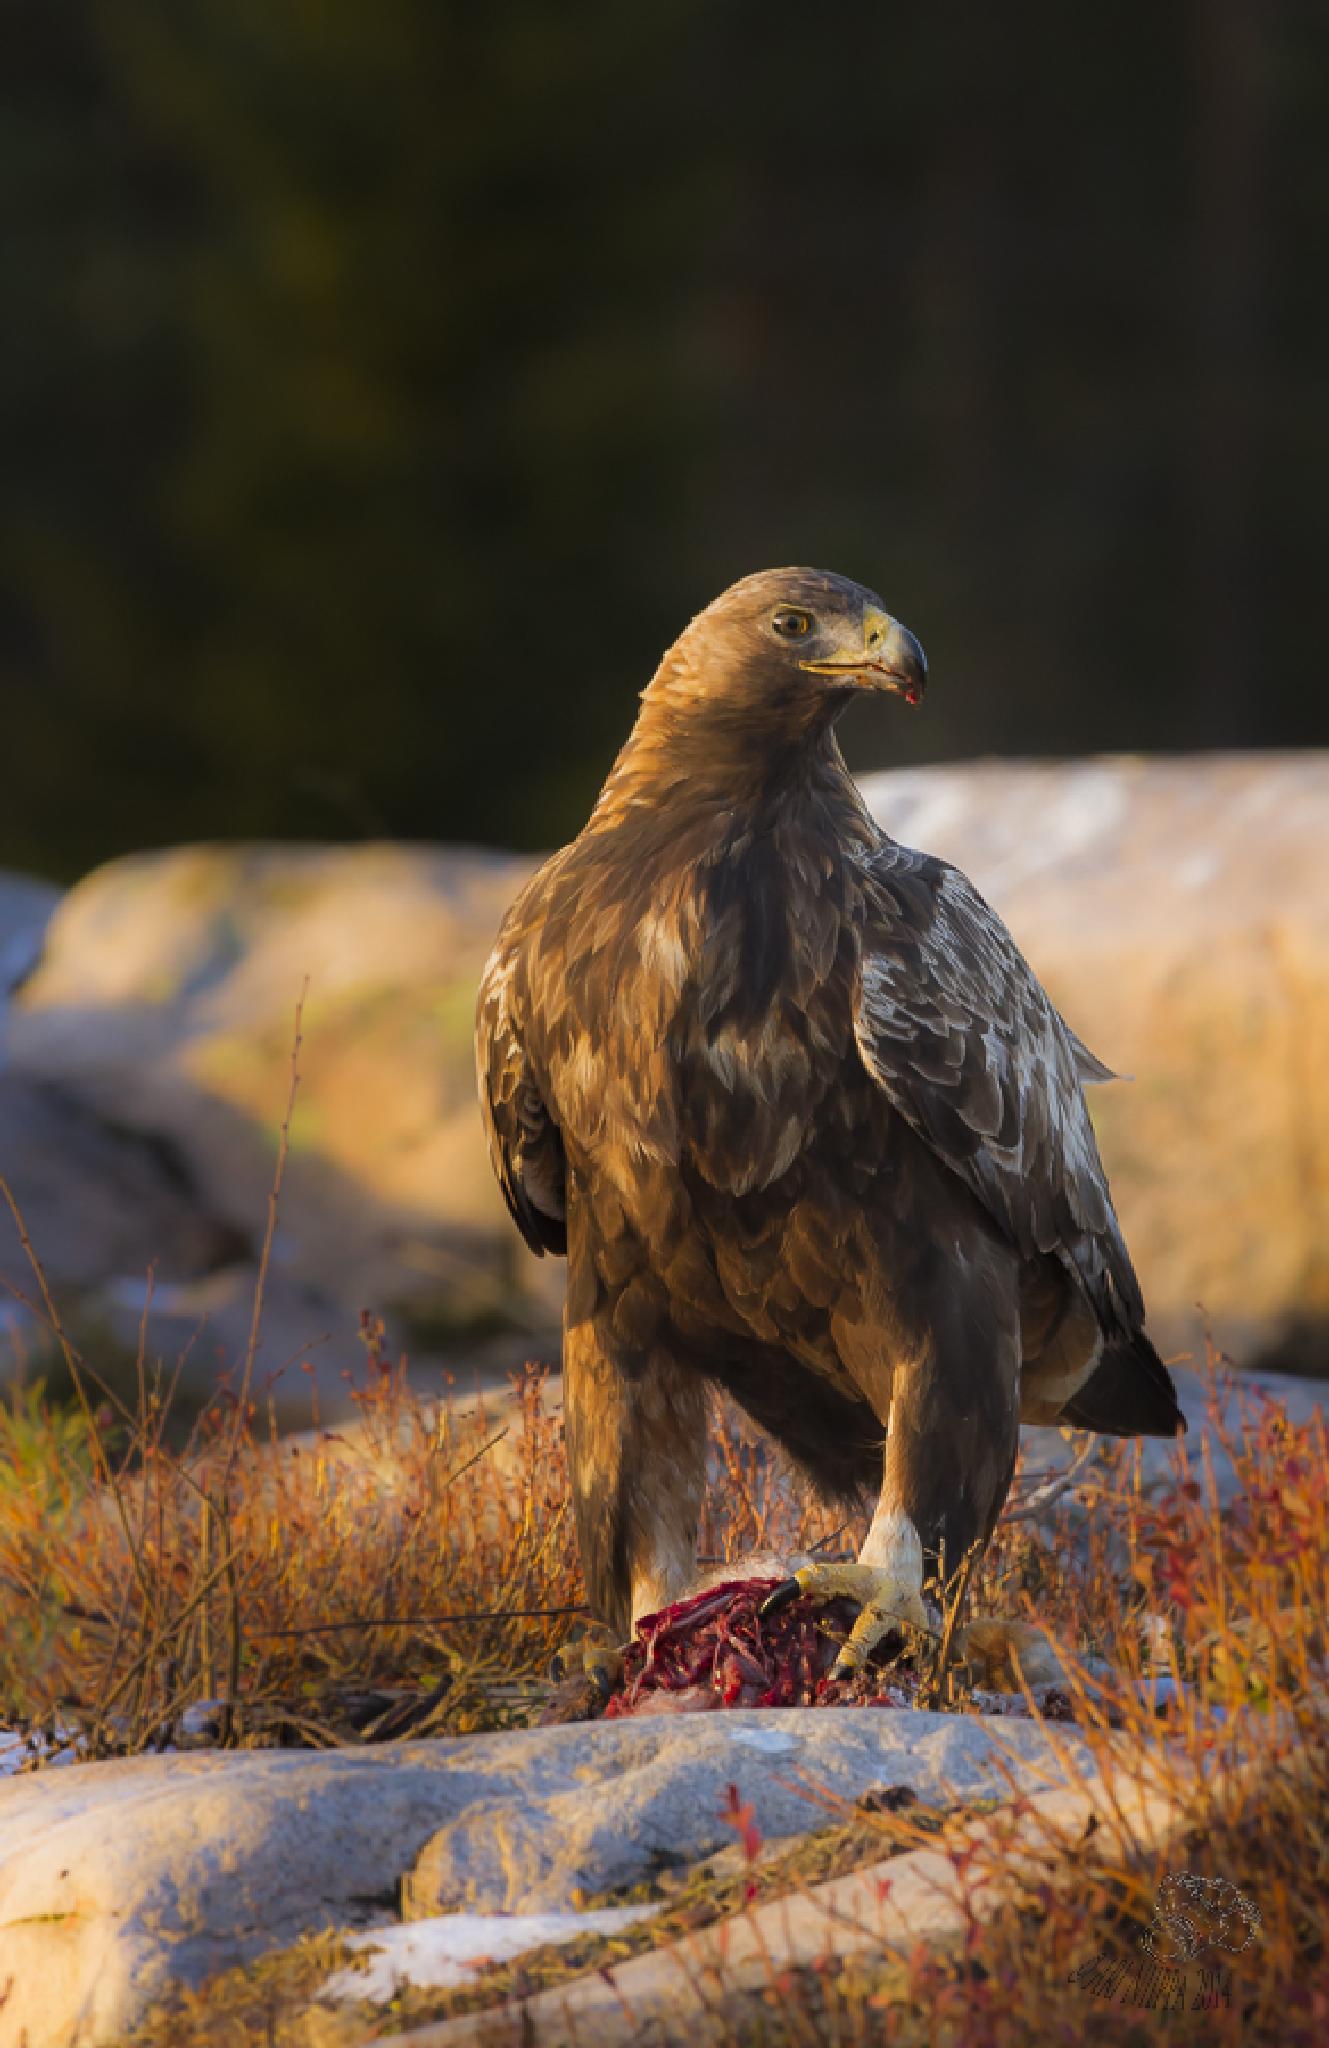 Golden Eagle and rabbit by Ari Niippa